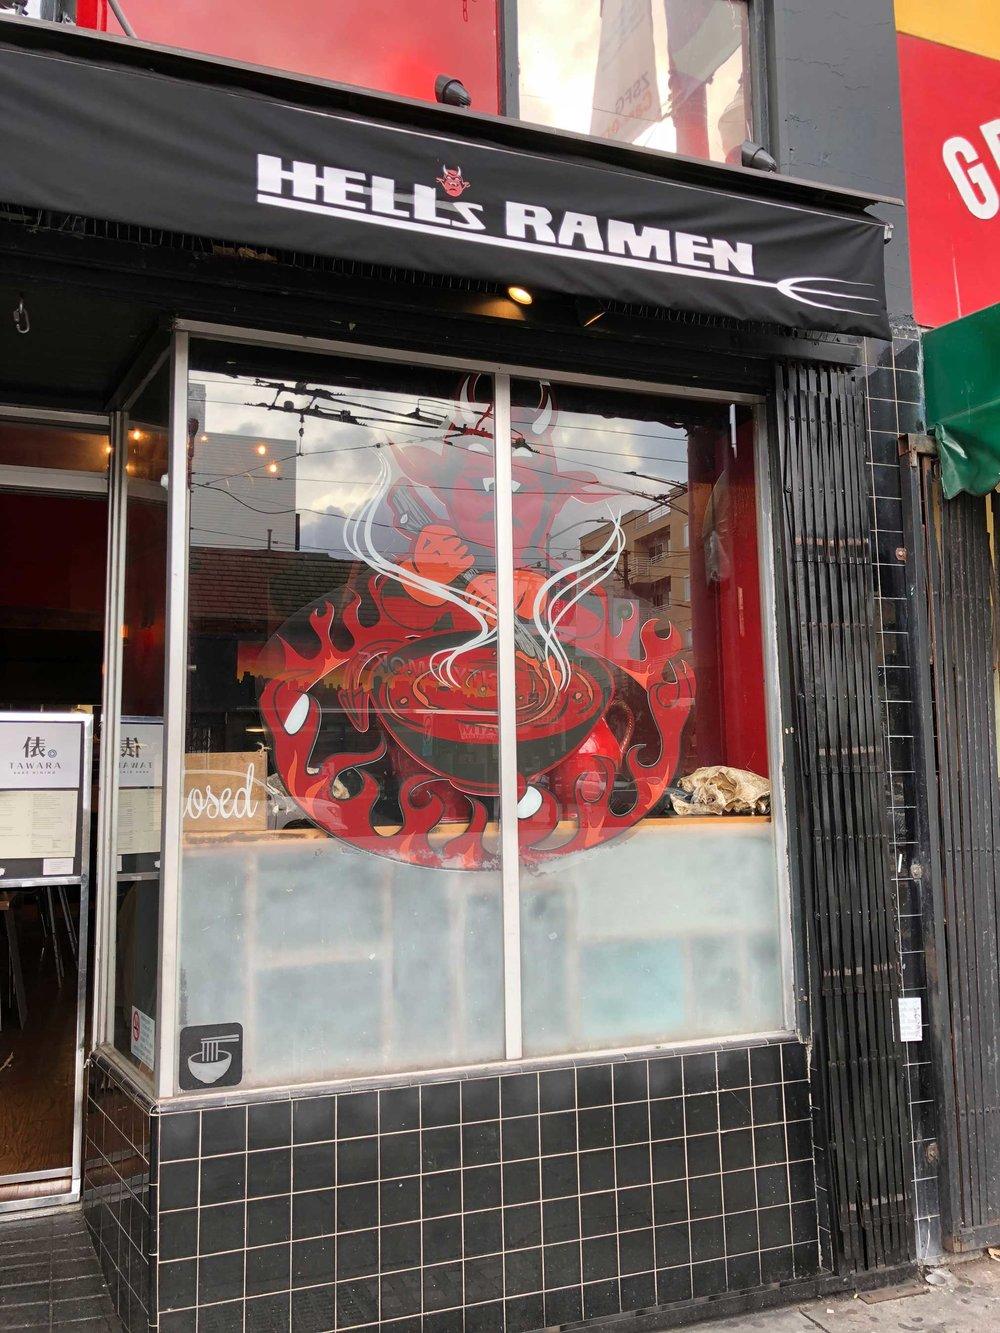 Hells-Ramen-San-Francisco-3.jpg